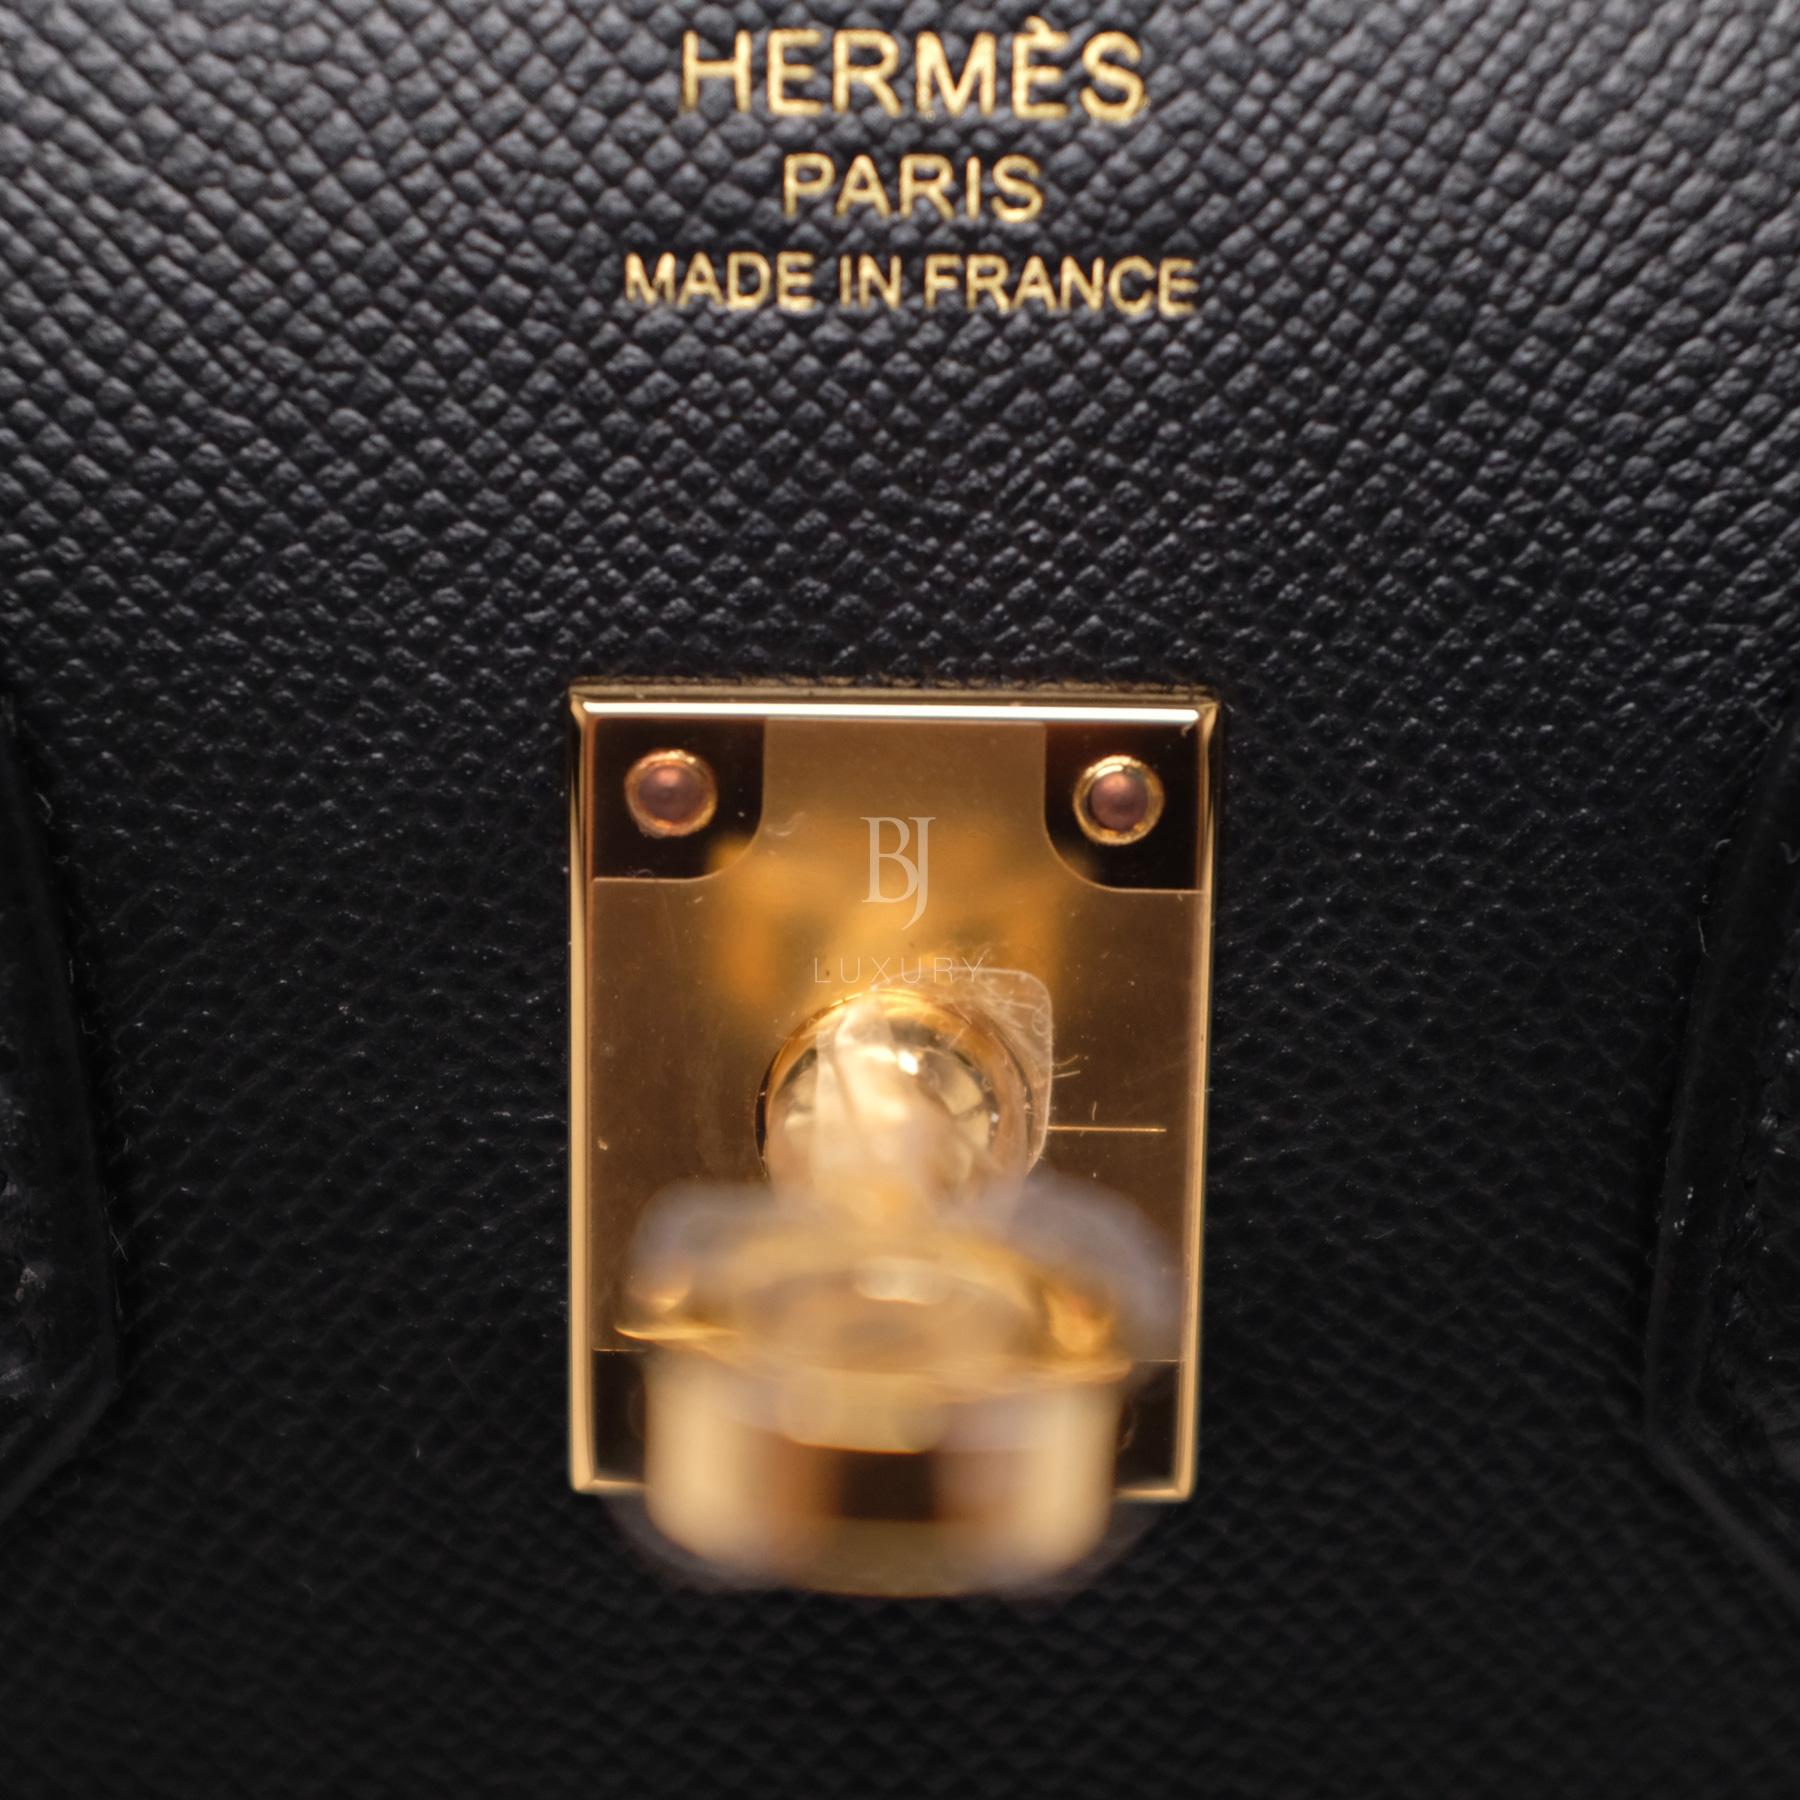 Birkin Sellier 25 Black Veau Madame Gold BJ Luxury 2.jpg